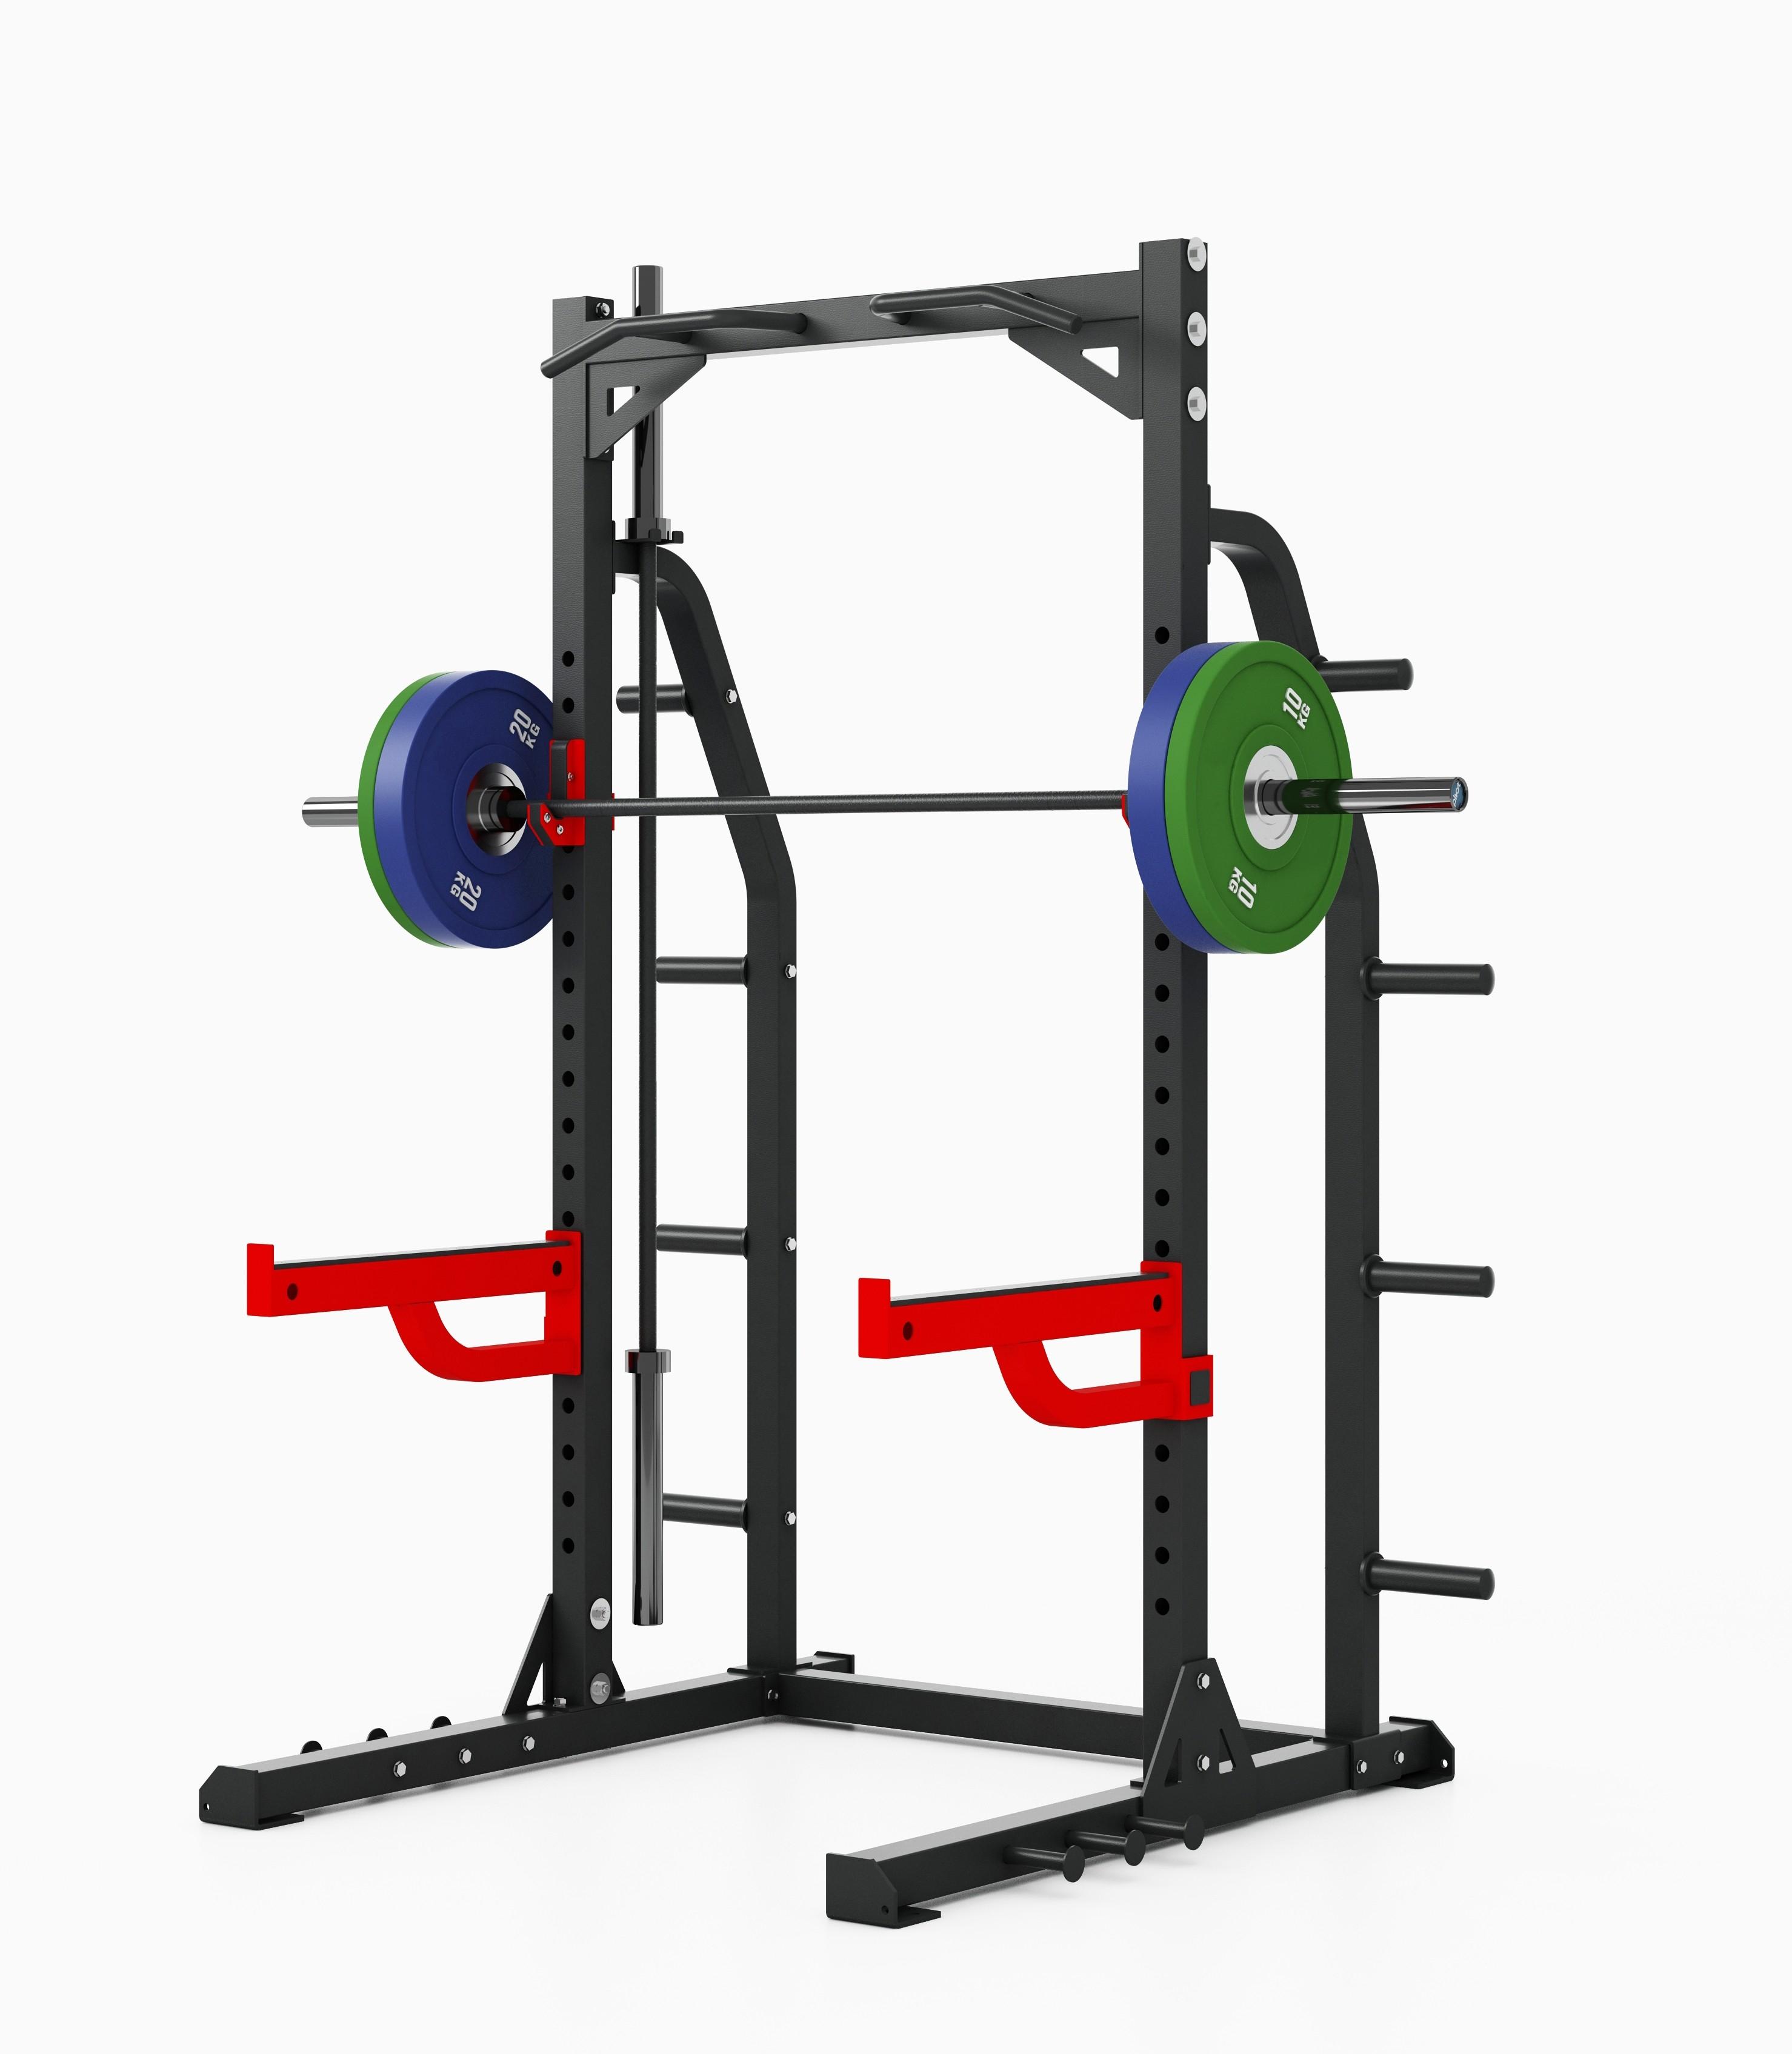 Titanium Strength HD Half Rack X Line - 100% Profesional